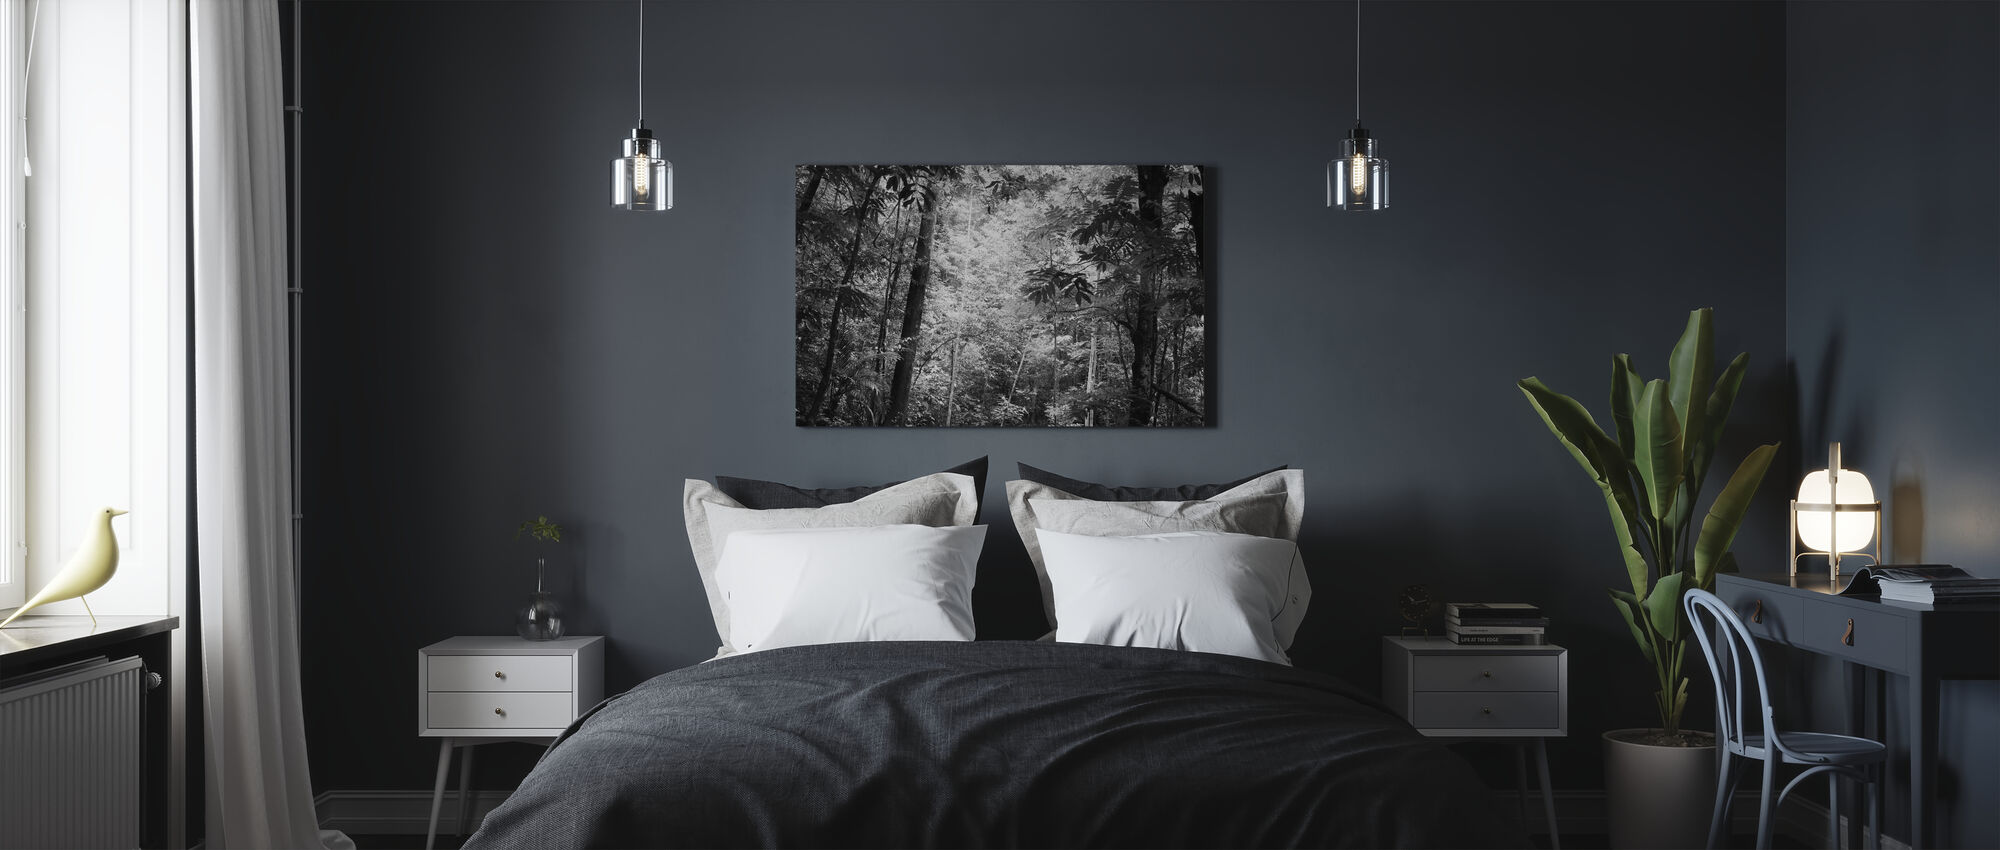 Höyrymetsä - b/w - Canvastaulu - Makuuhuone